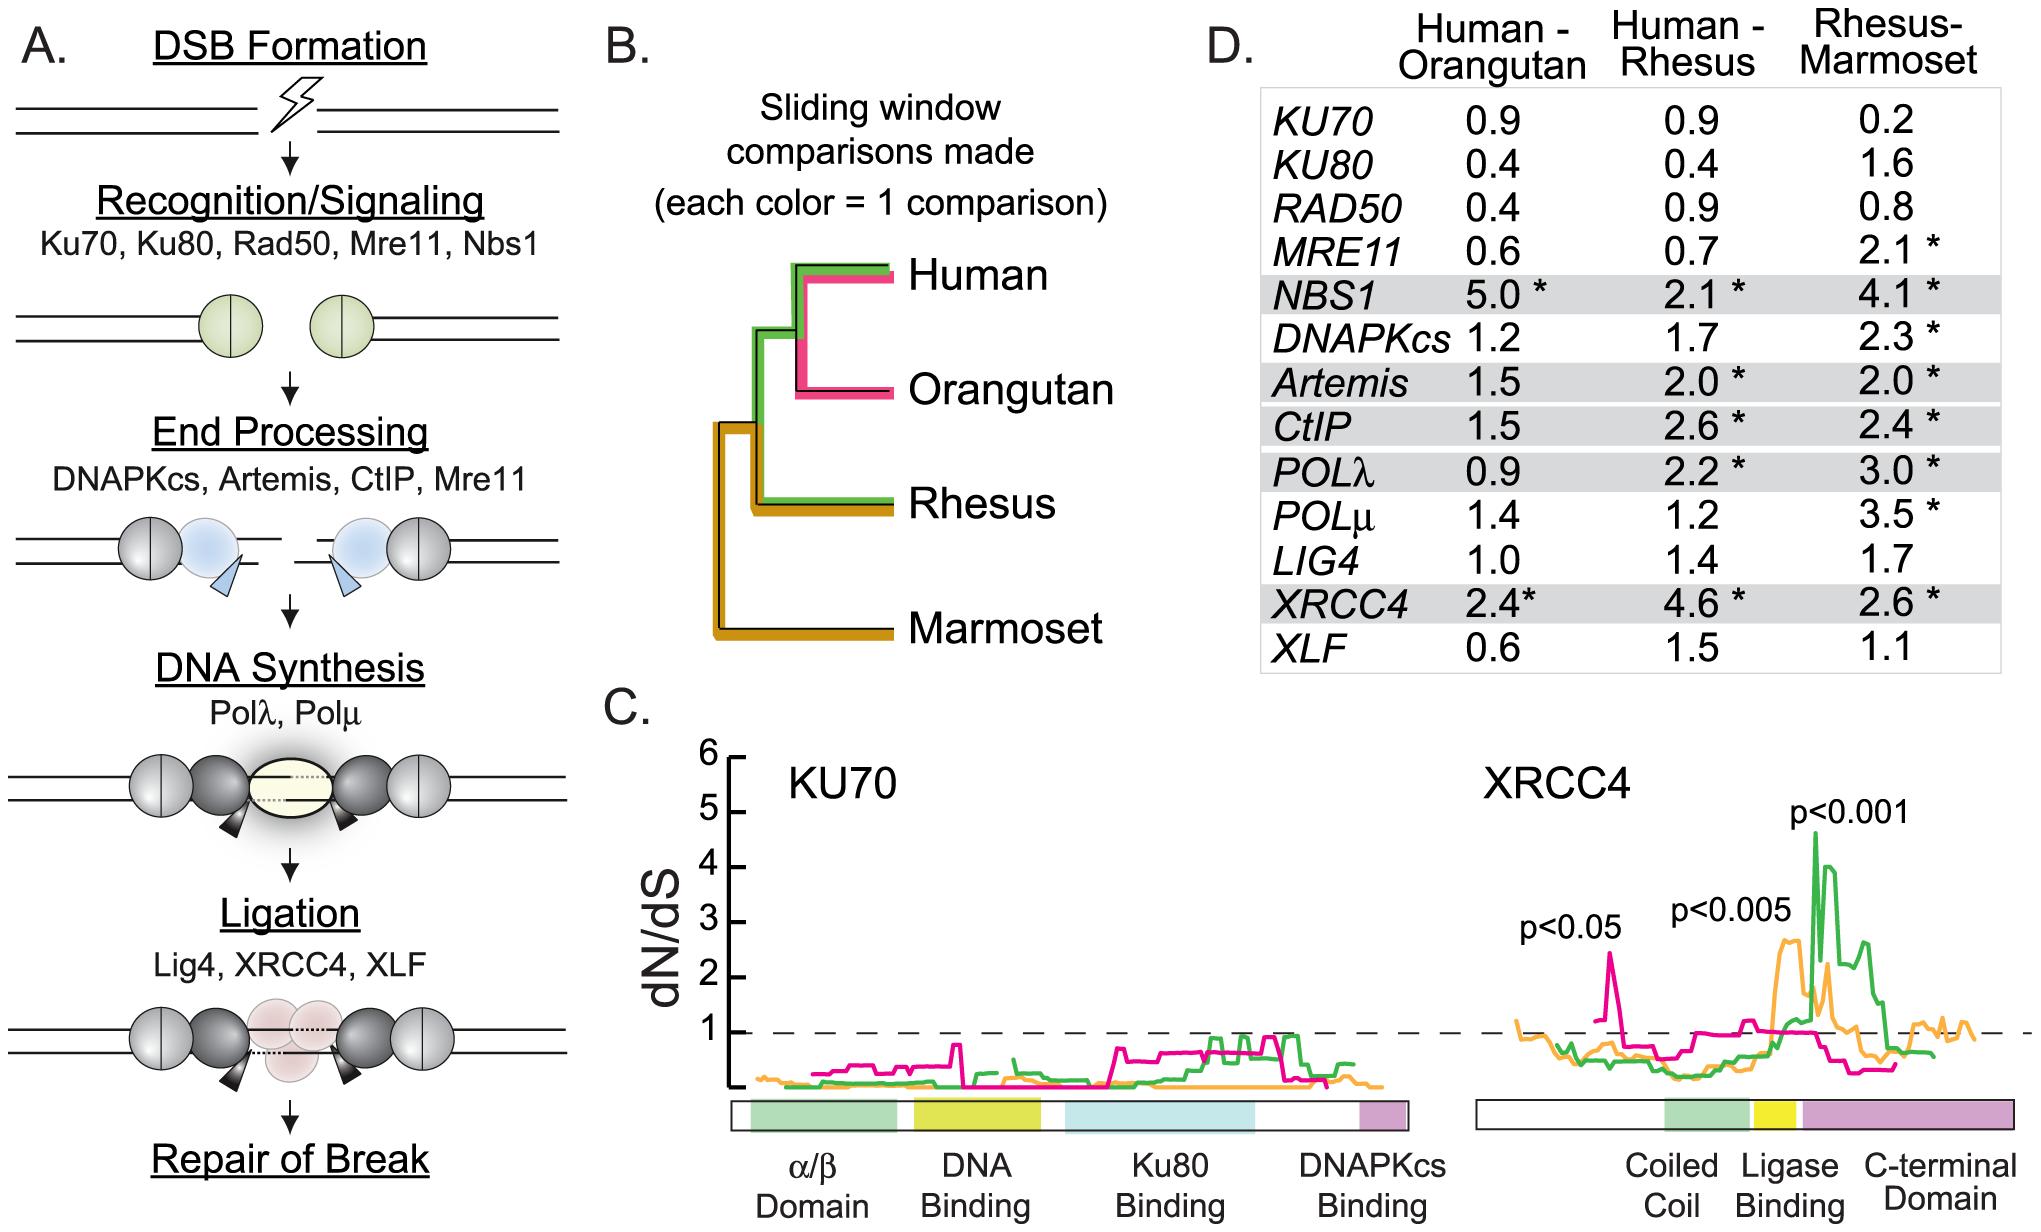 Sliding window analysis identifies five candidate NHEJ genes evolving under positive selection.